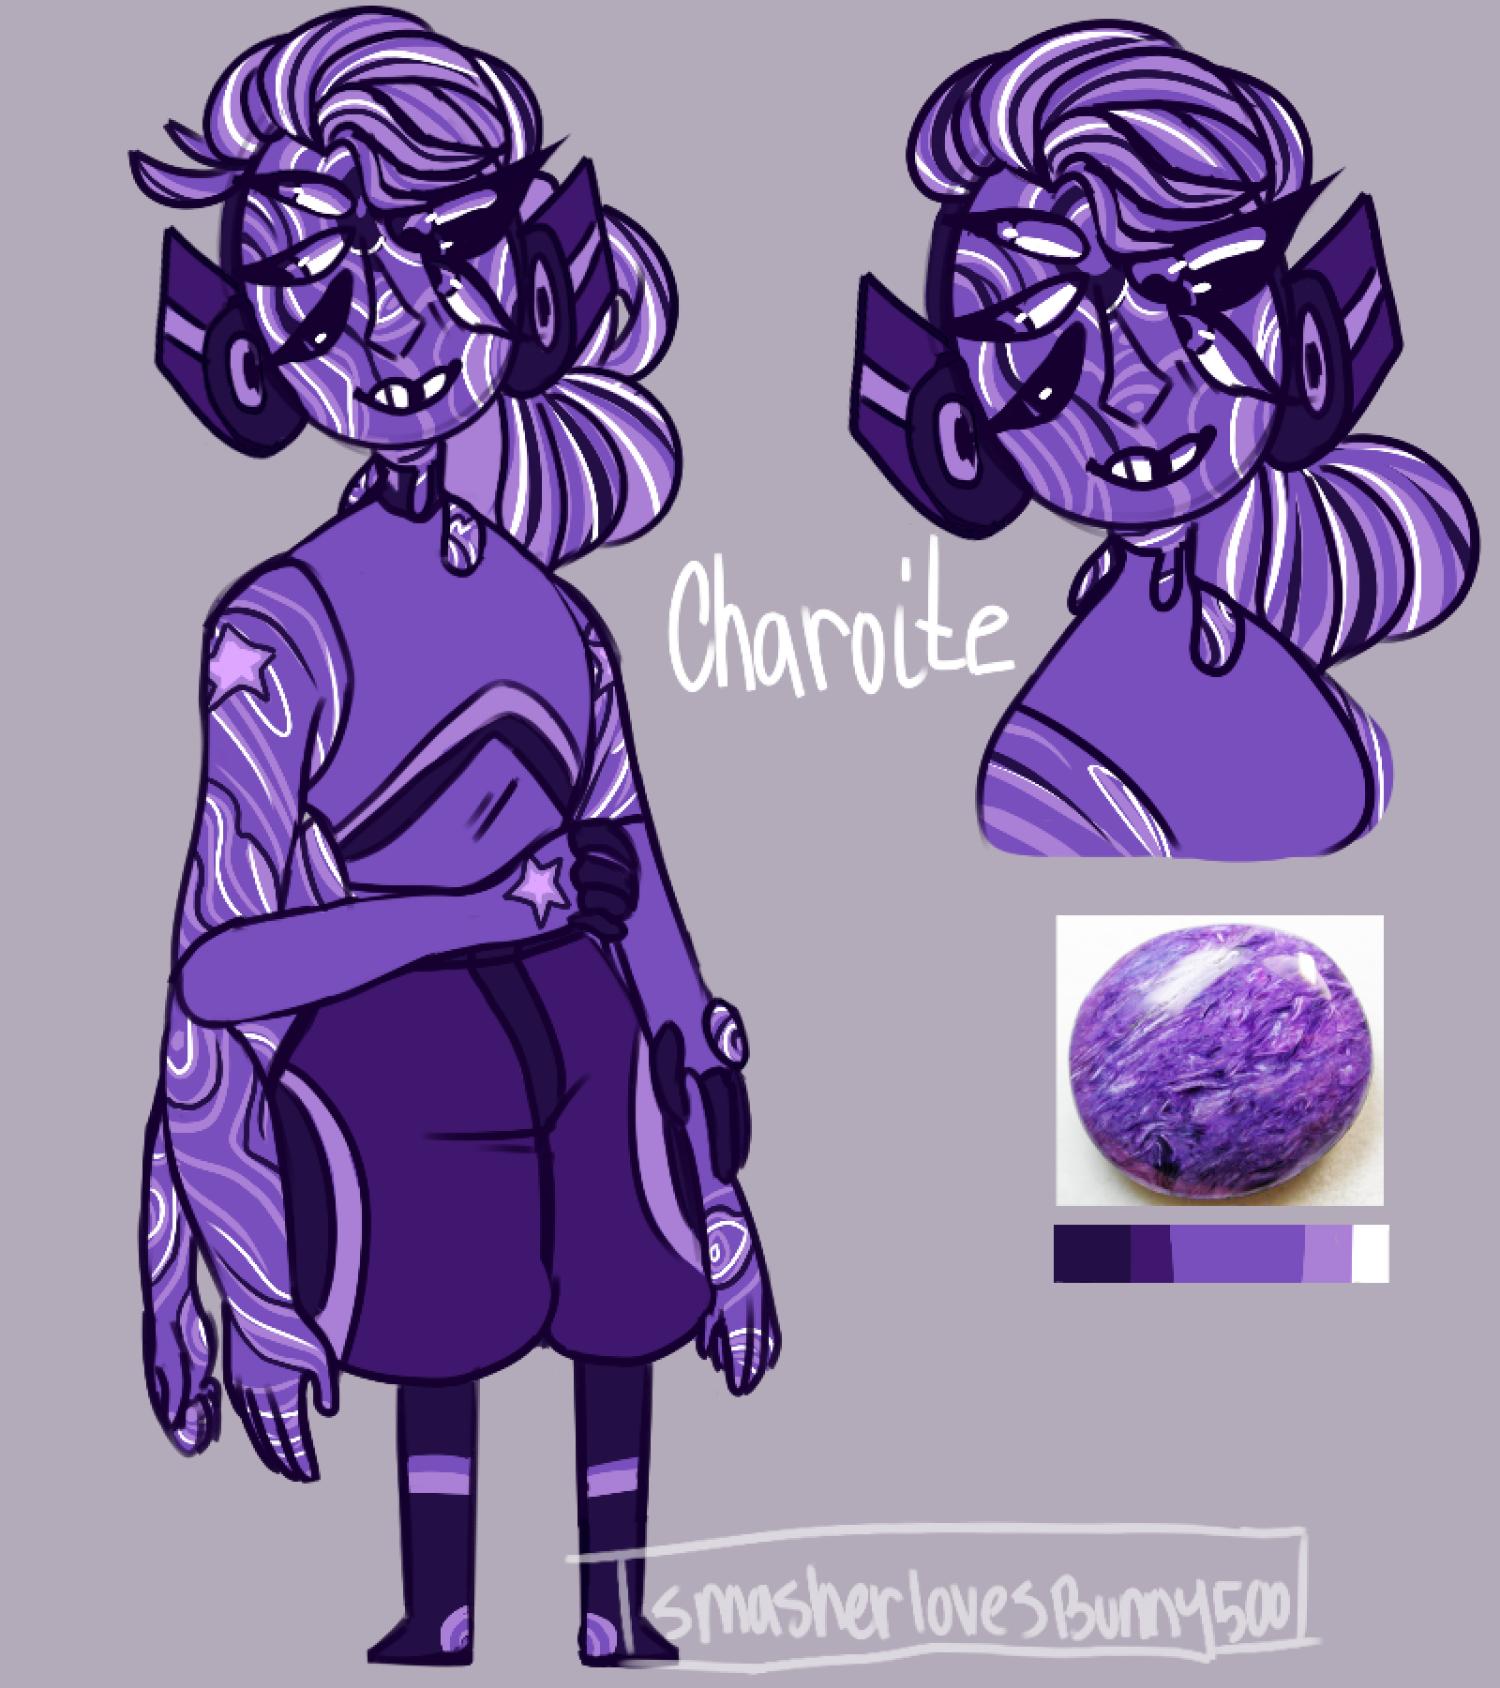 Charoite [GIFT] by SmasherlovesBunny500